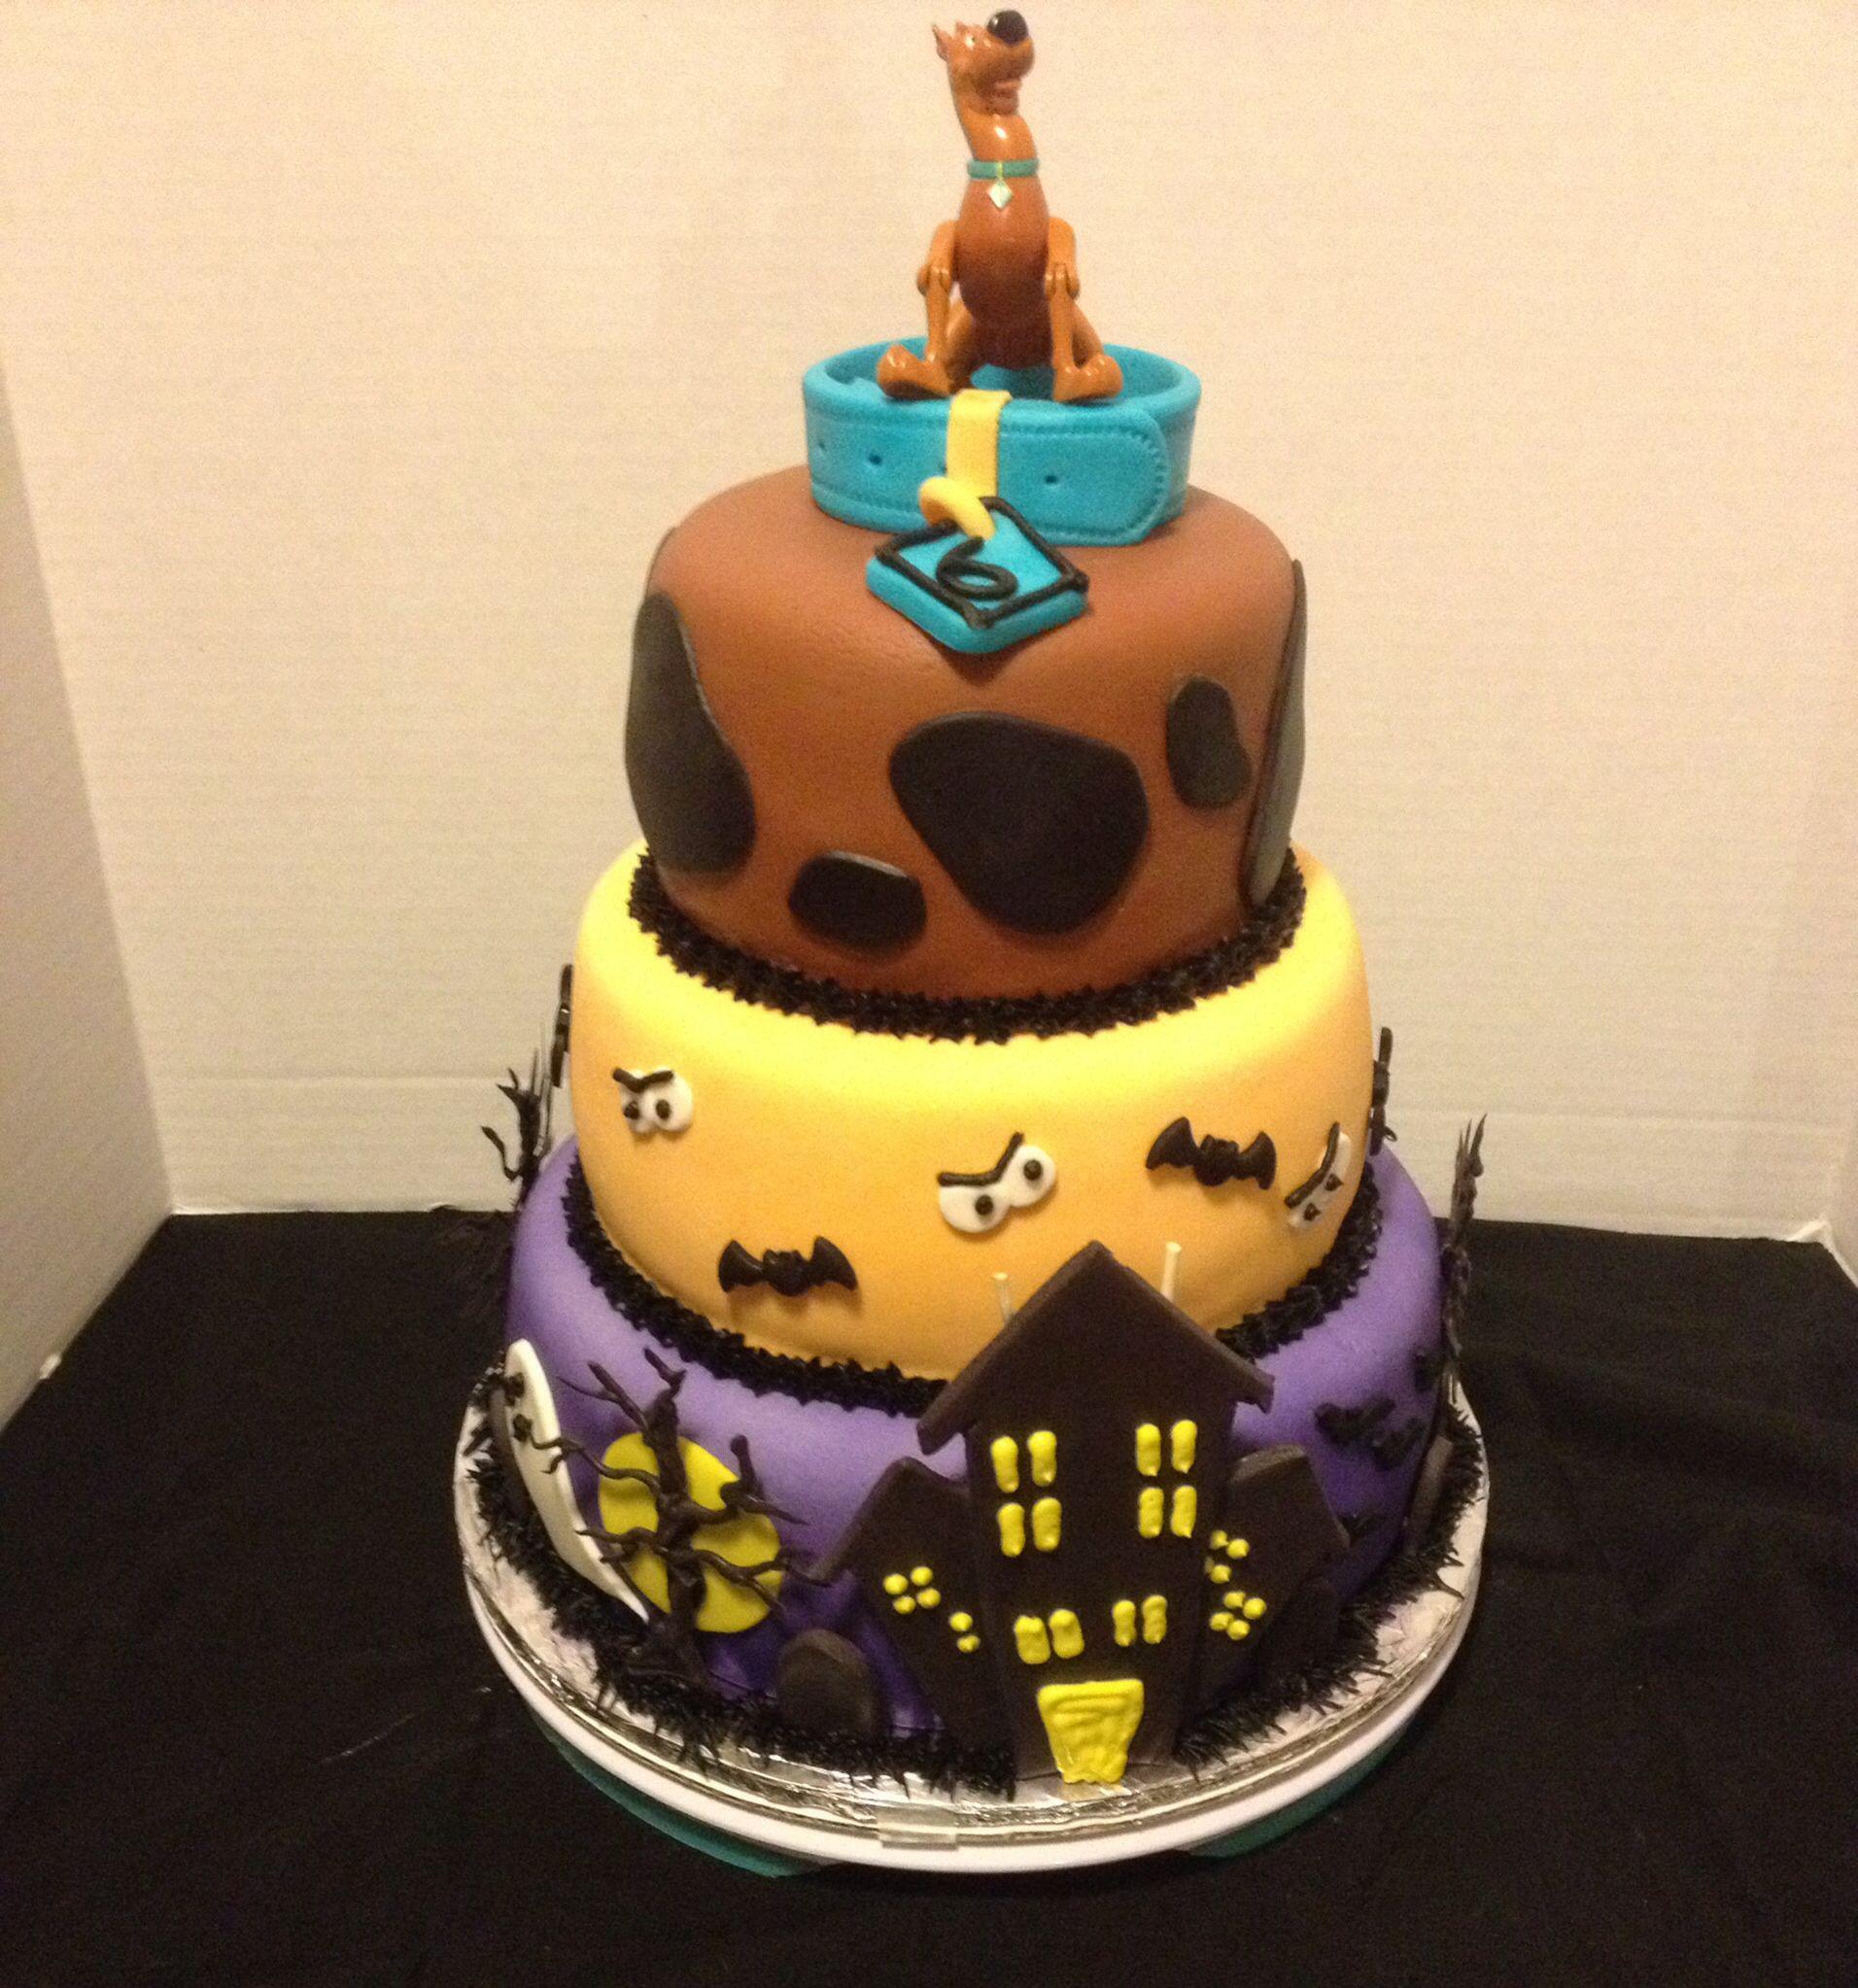 Scooby Doo Birthday Cakes  Scooby doo birthday cake Party ideas